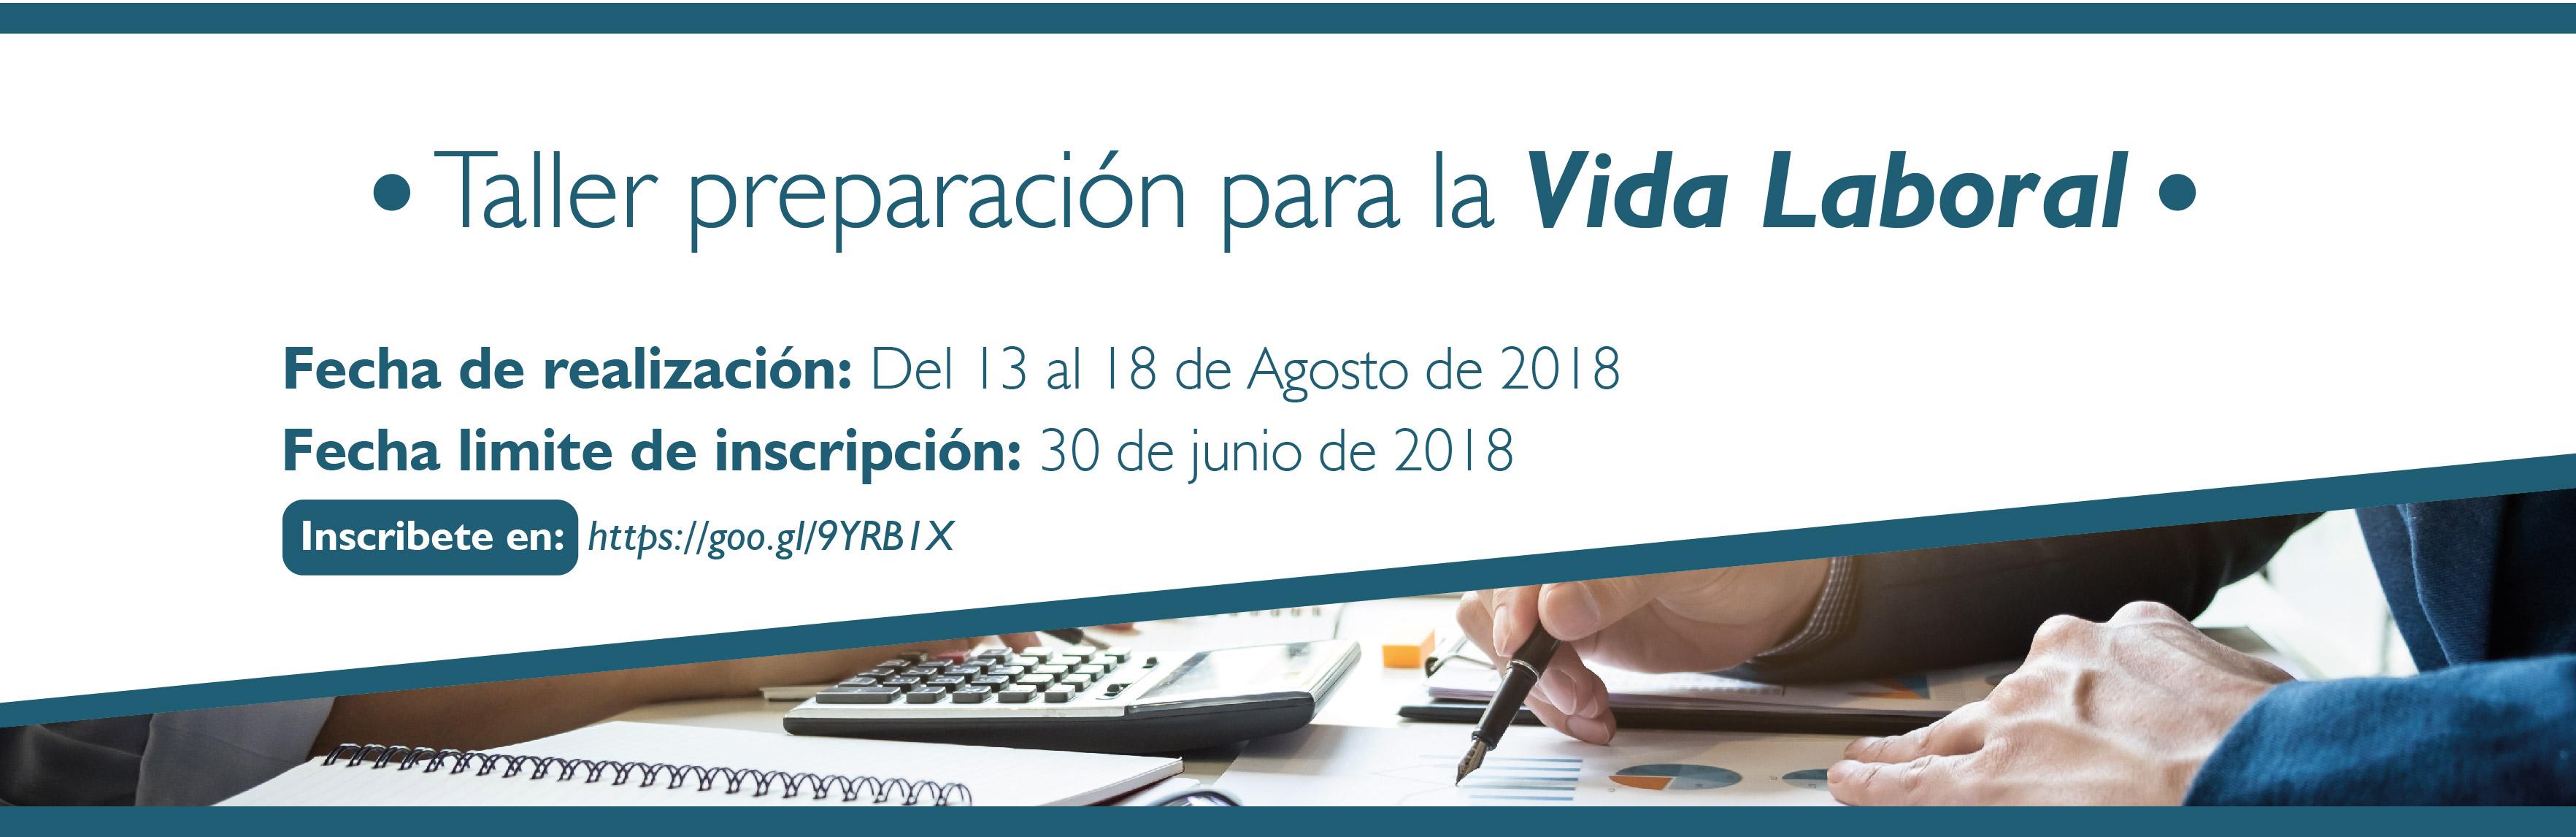 http://fayol.univalle.edu.co/bannerhtml5/2018-08-13-Taller-preparacion-la-vida-04.jpg